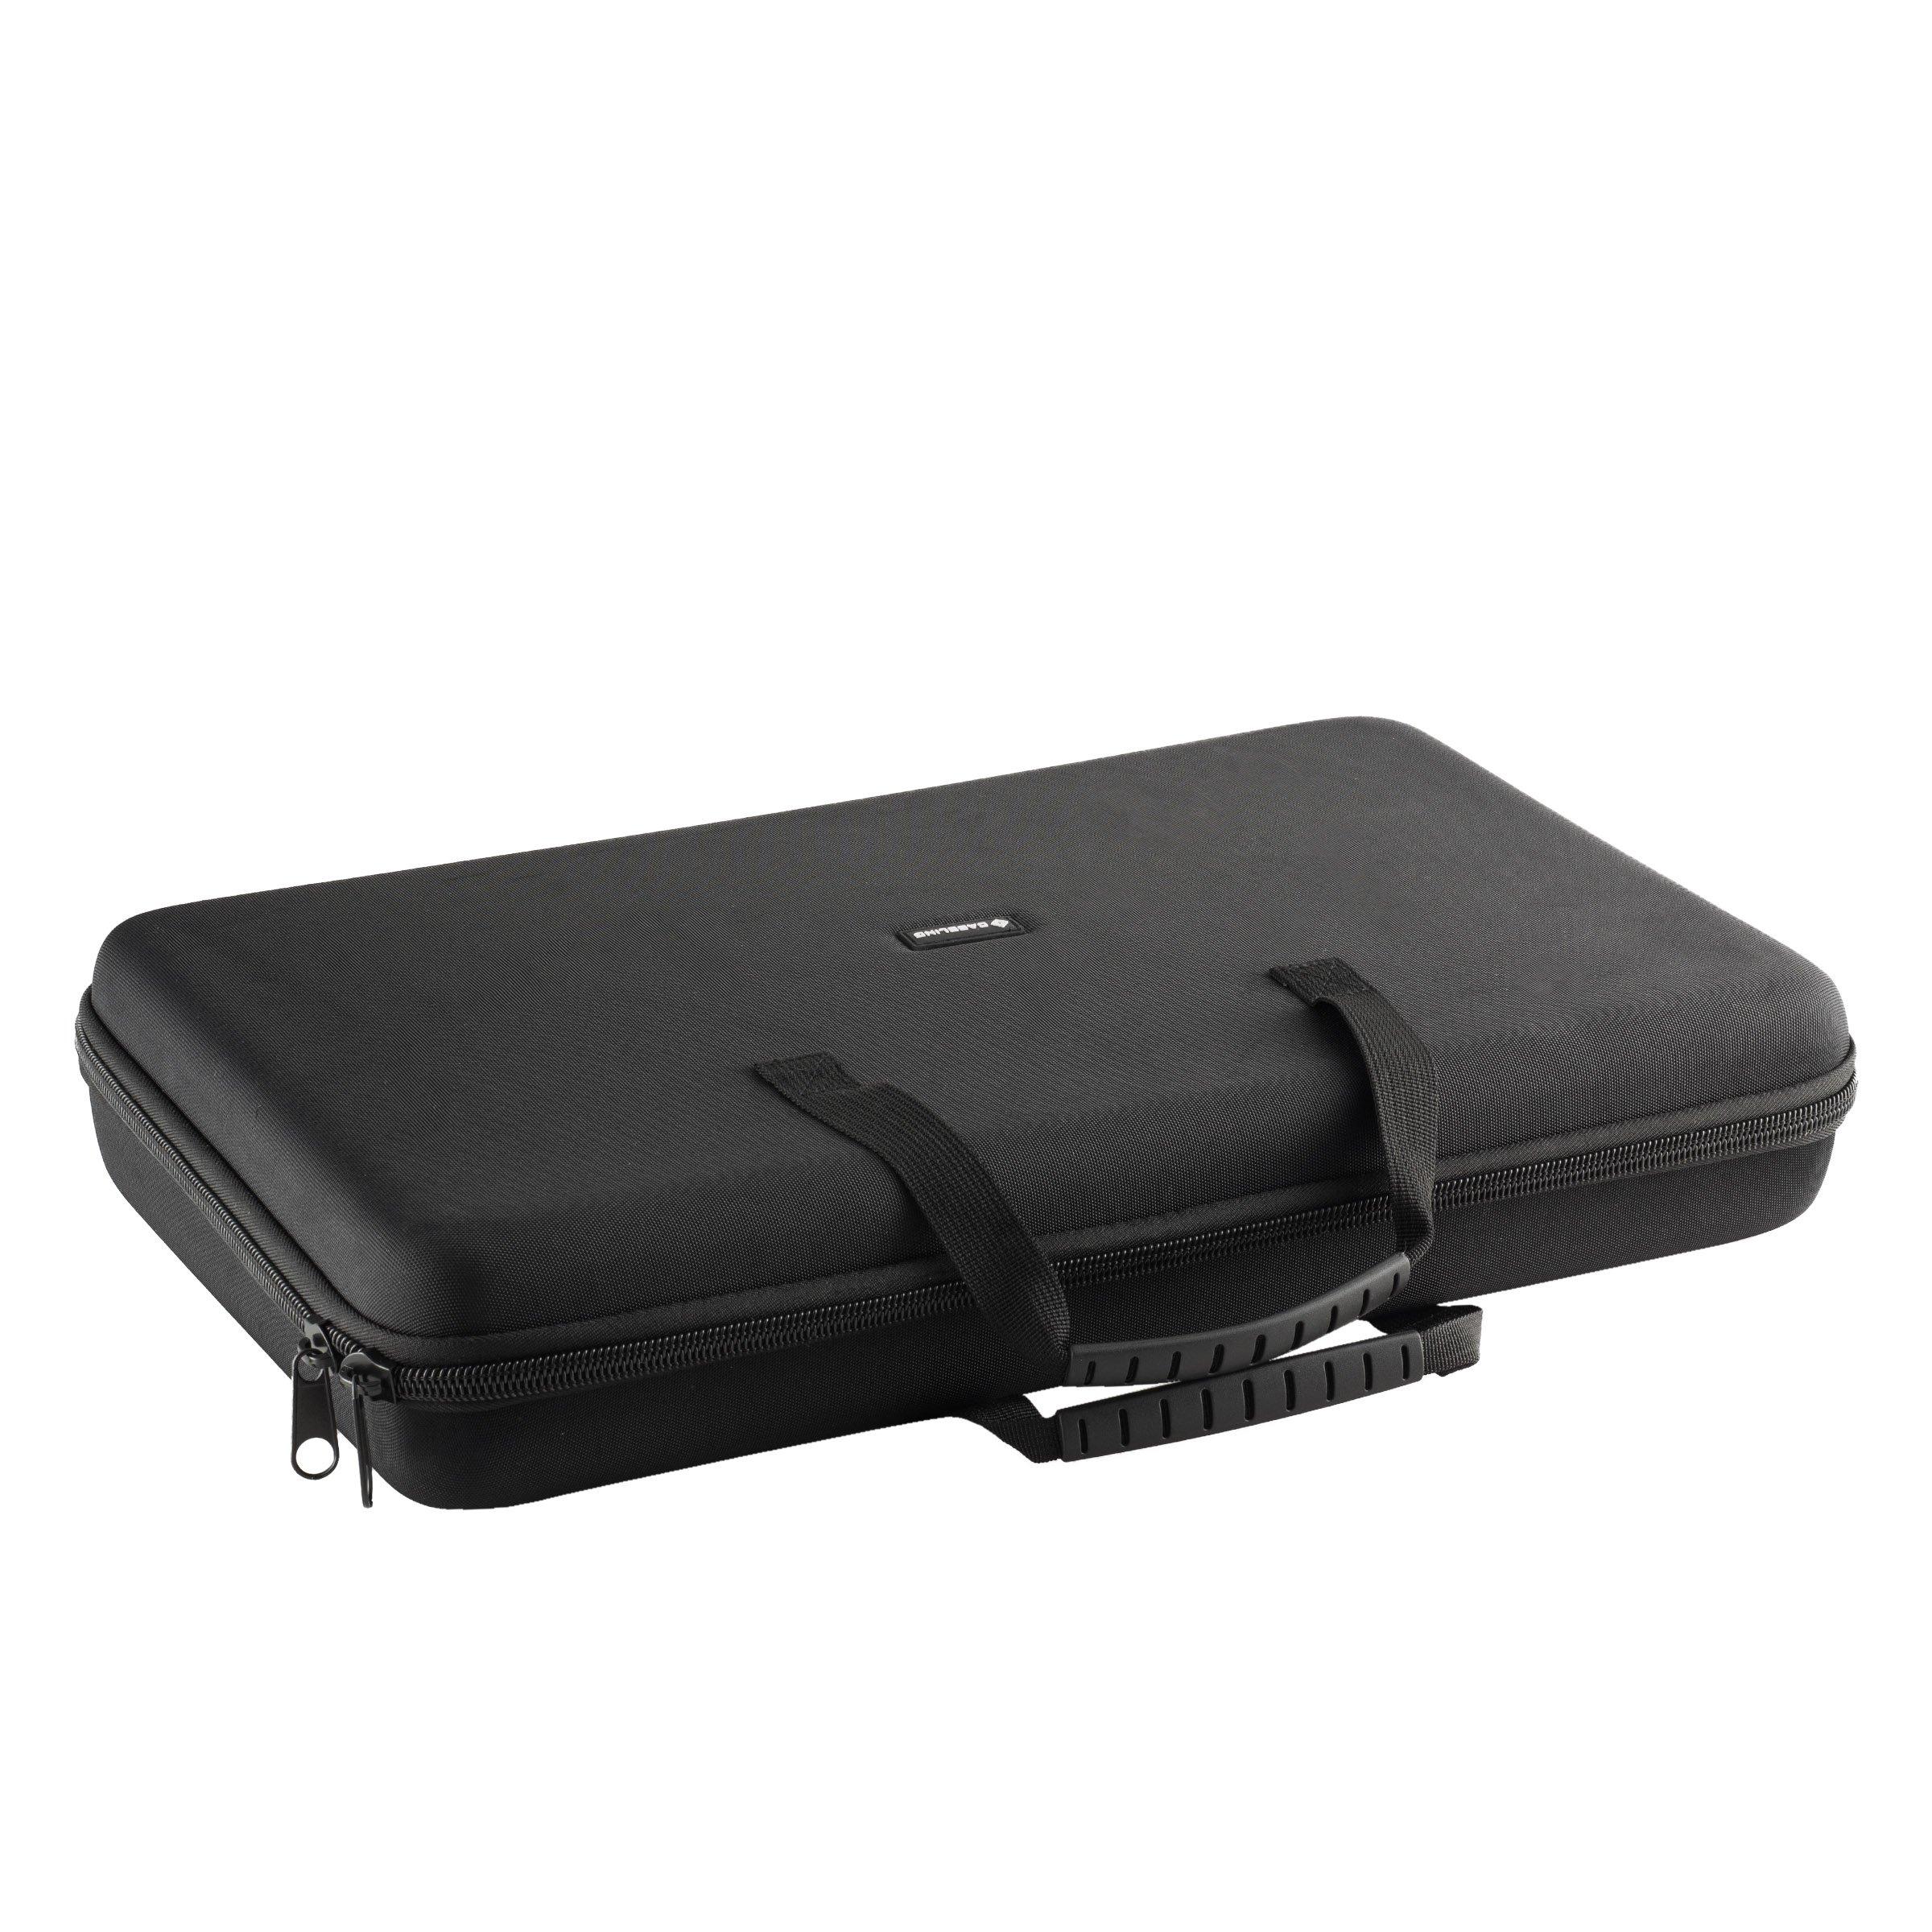 Hard CASE for Pioneer DJ DDJ-SB3 & DDJ-SB2 DJ Controller. By Caseling